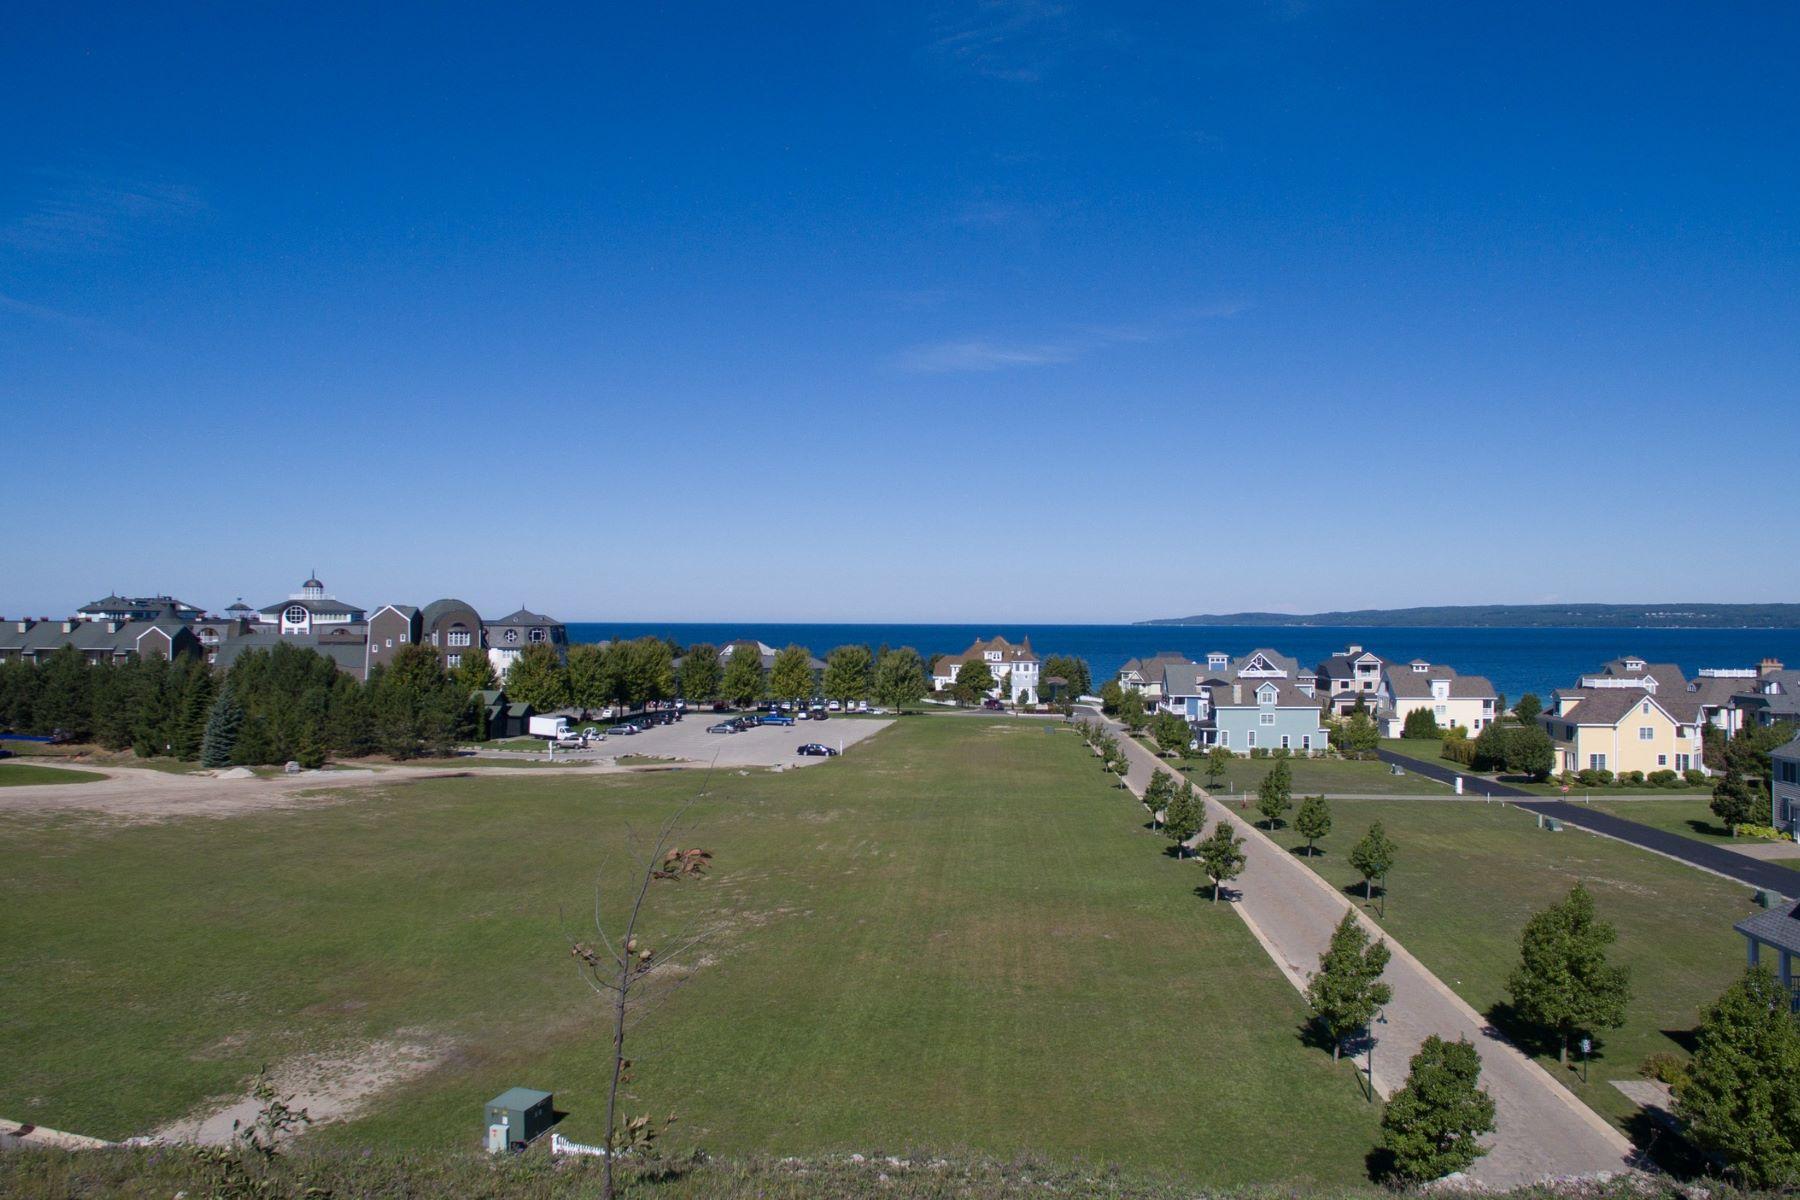 Land for Sale at Unit 6, The Ridge 3768 Cliffs Drive, Unit 6, The Ridge Bay Harbor, Michigan 49770 United States